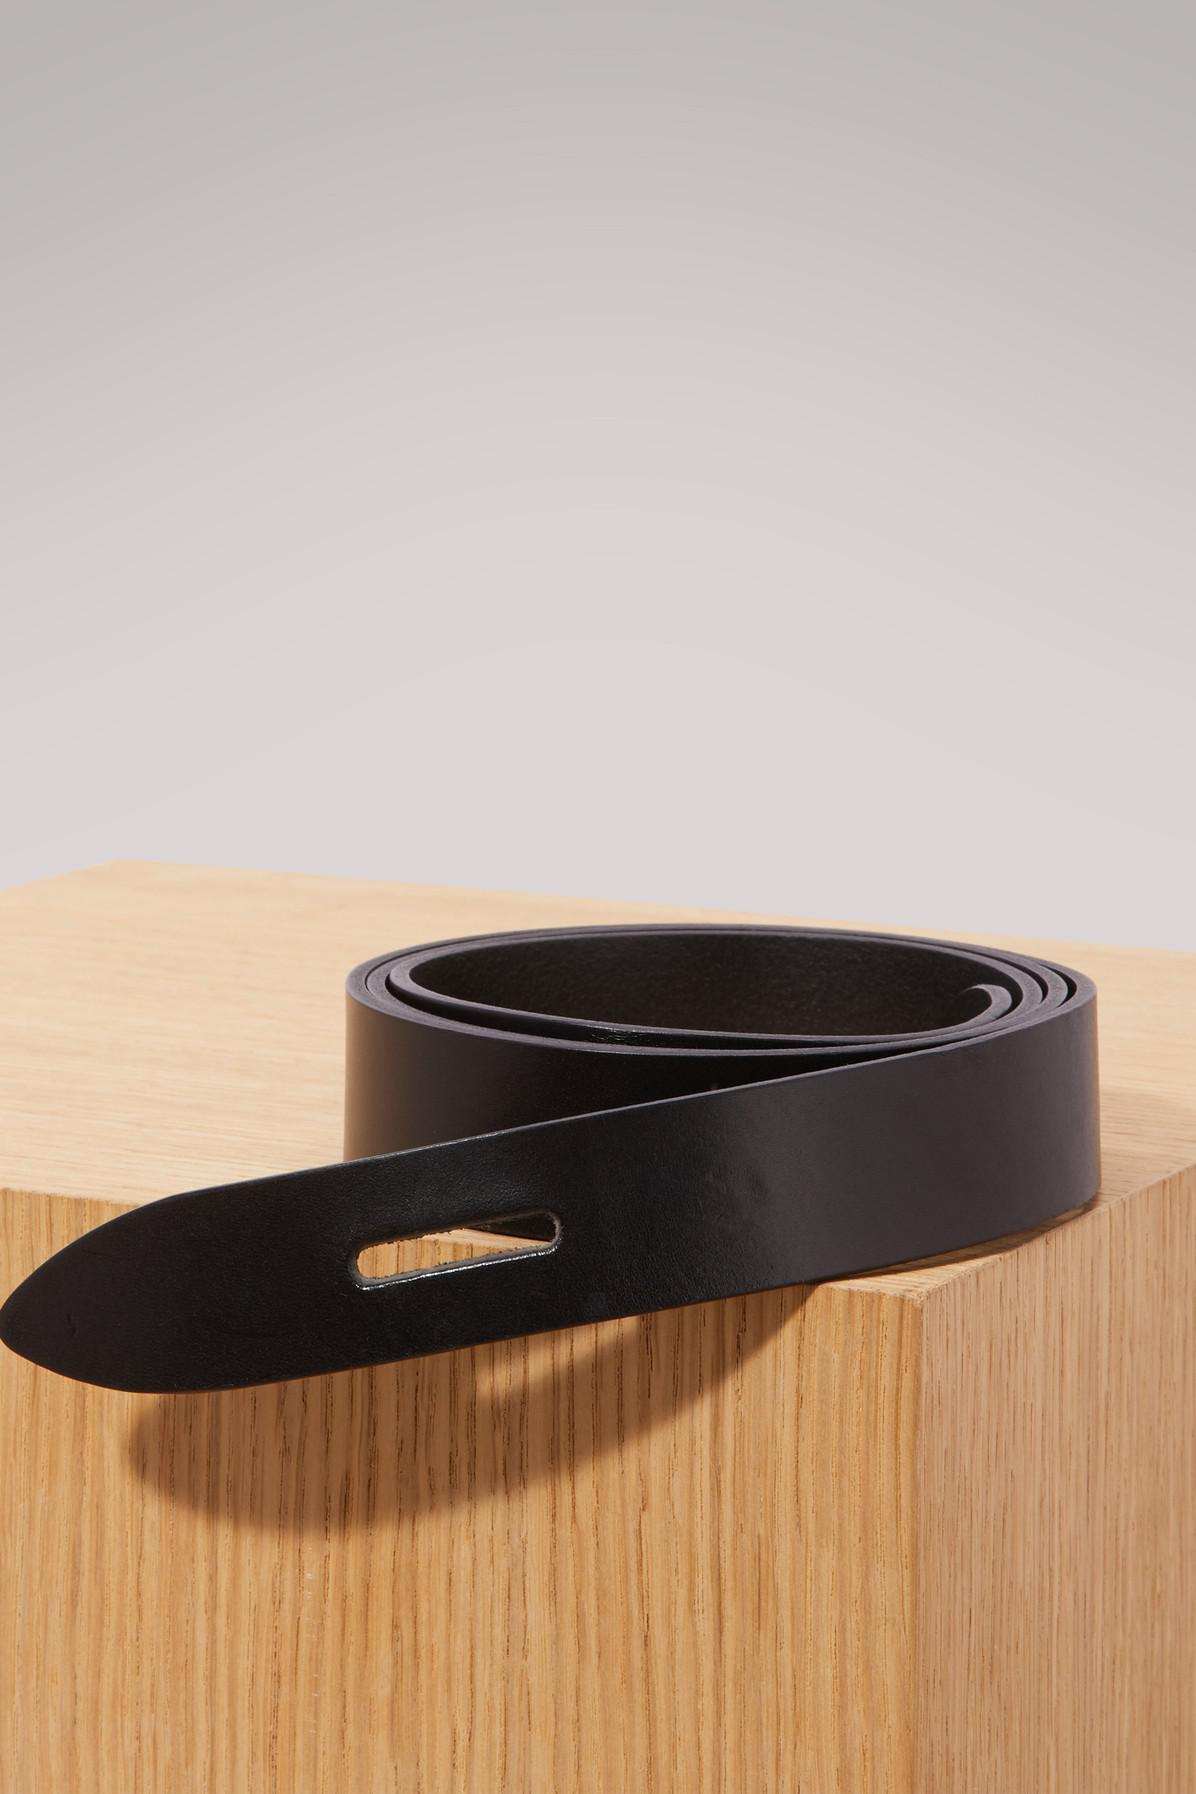 8daf755b1472 Isabel Marant Leather Lecce Belt in Black - Lyst